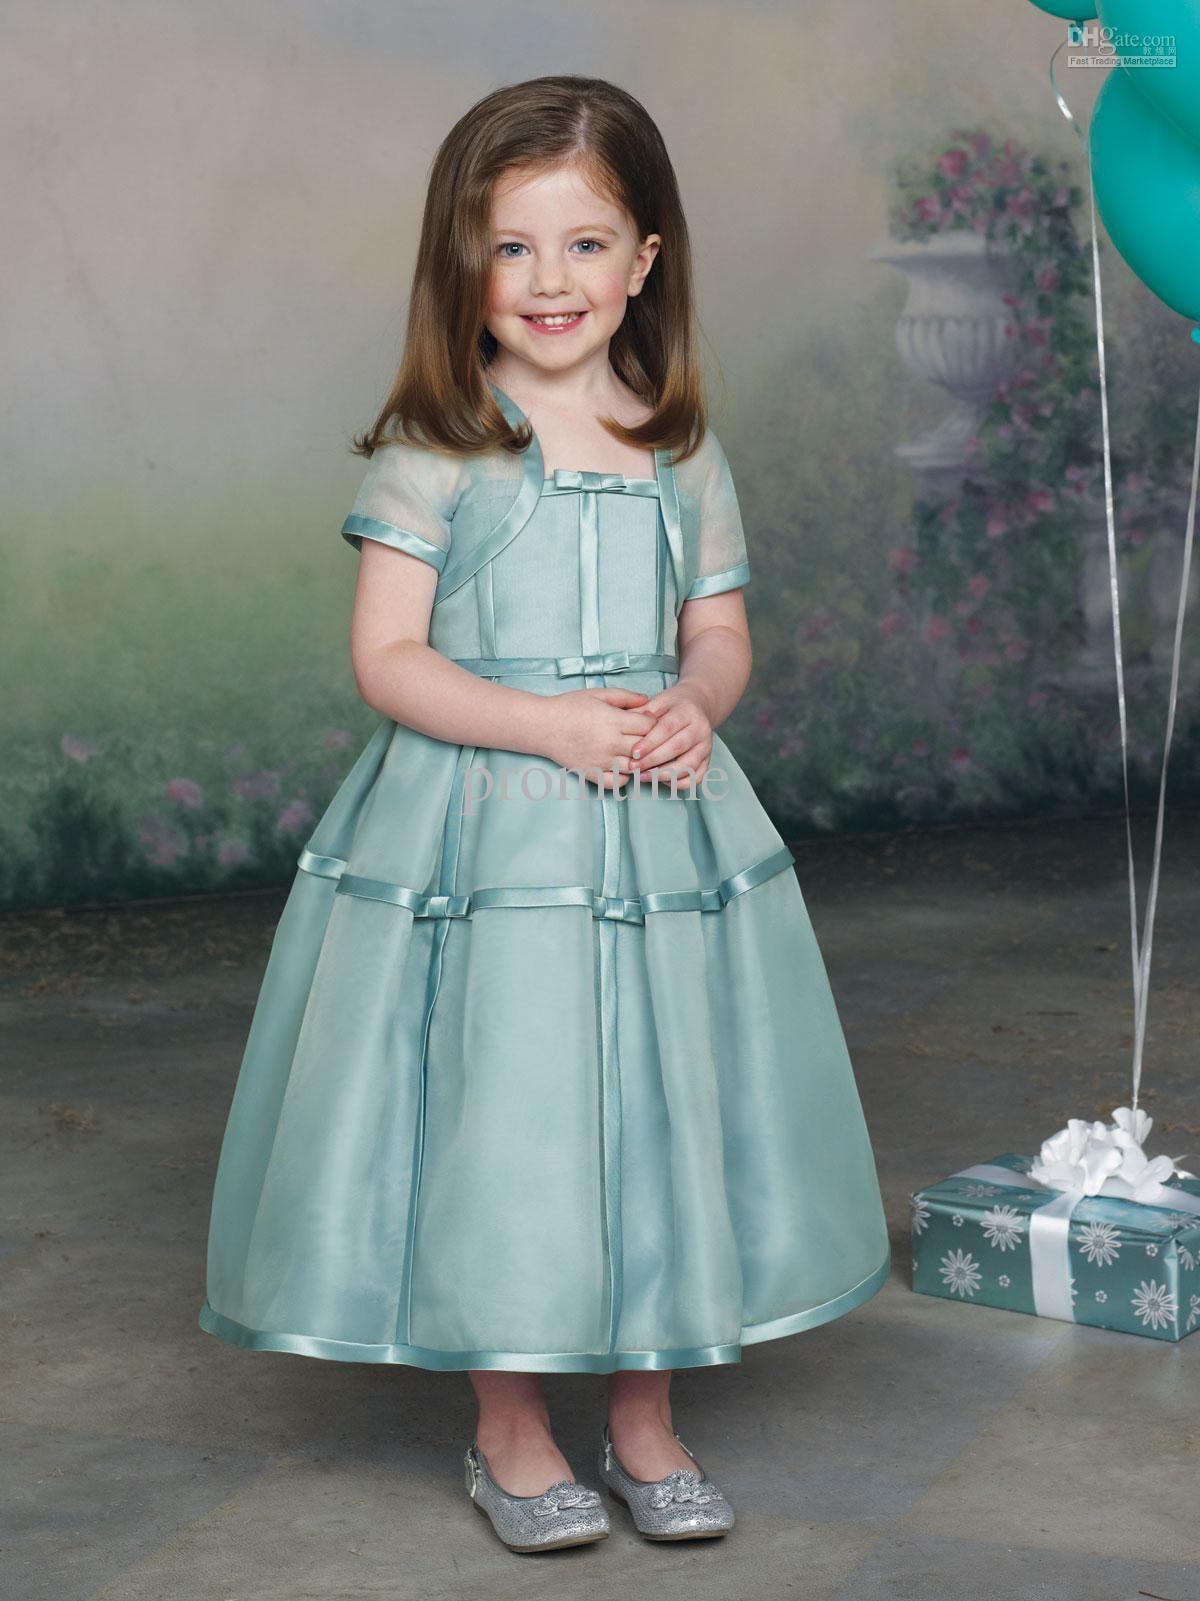 Excellent Dress For Little Girl For A Wedding Photos - Wedding Ideas ...